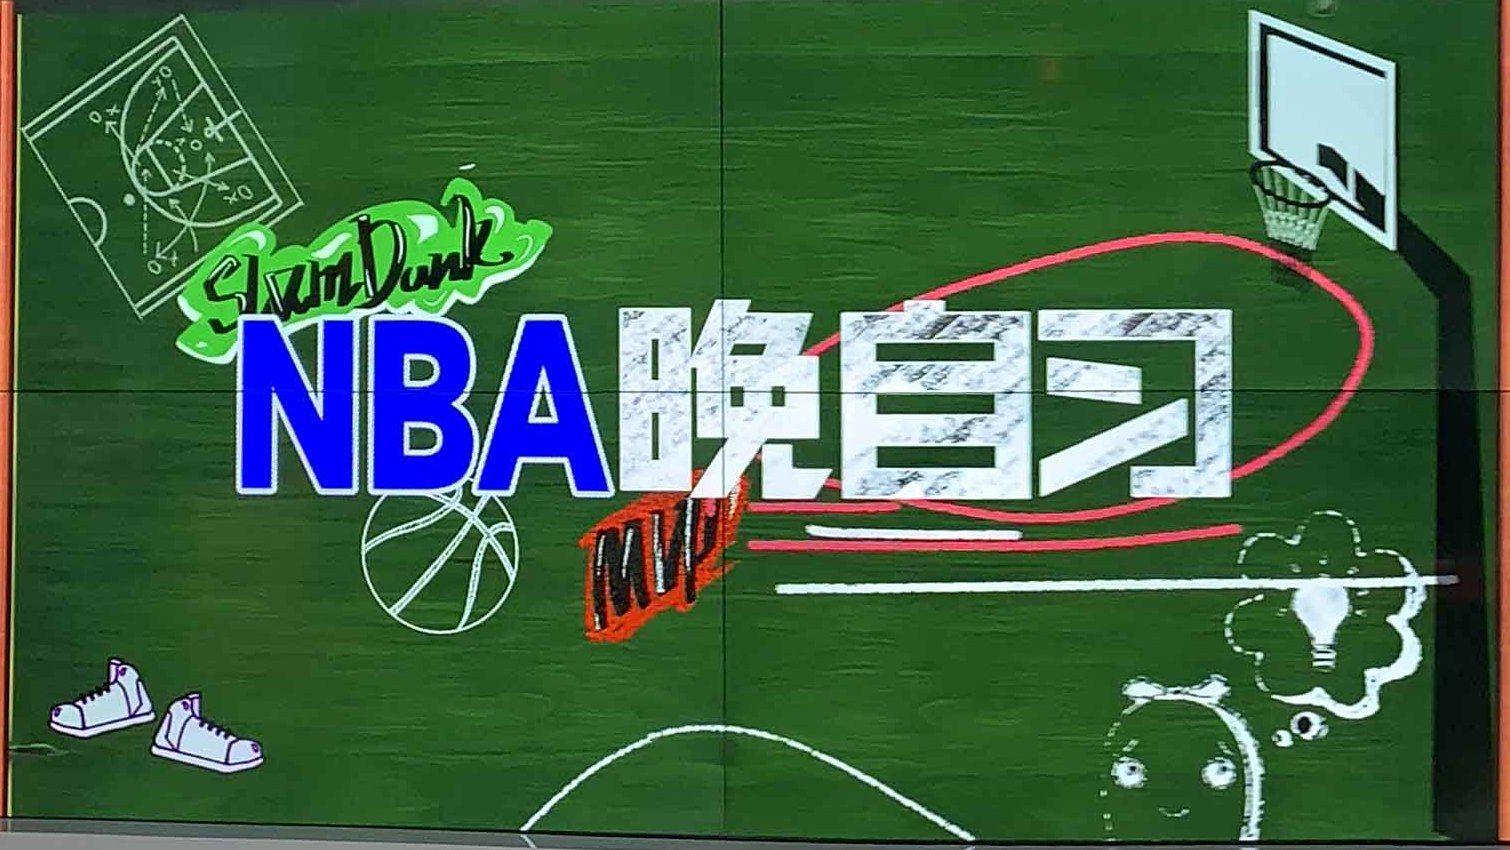 《NBA晚自习》第一期 苏群学霸激烈互掐欧文是否适合当领袖_NBA晚自习